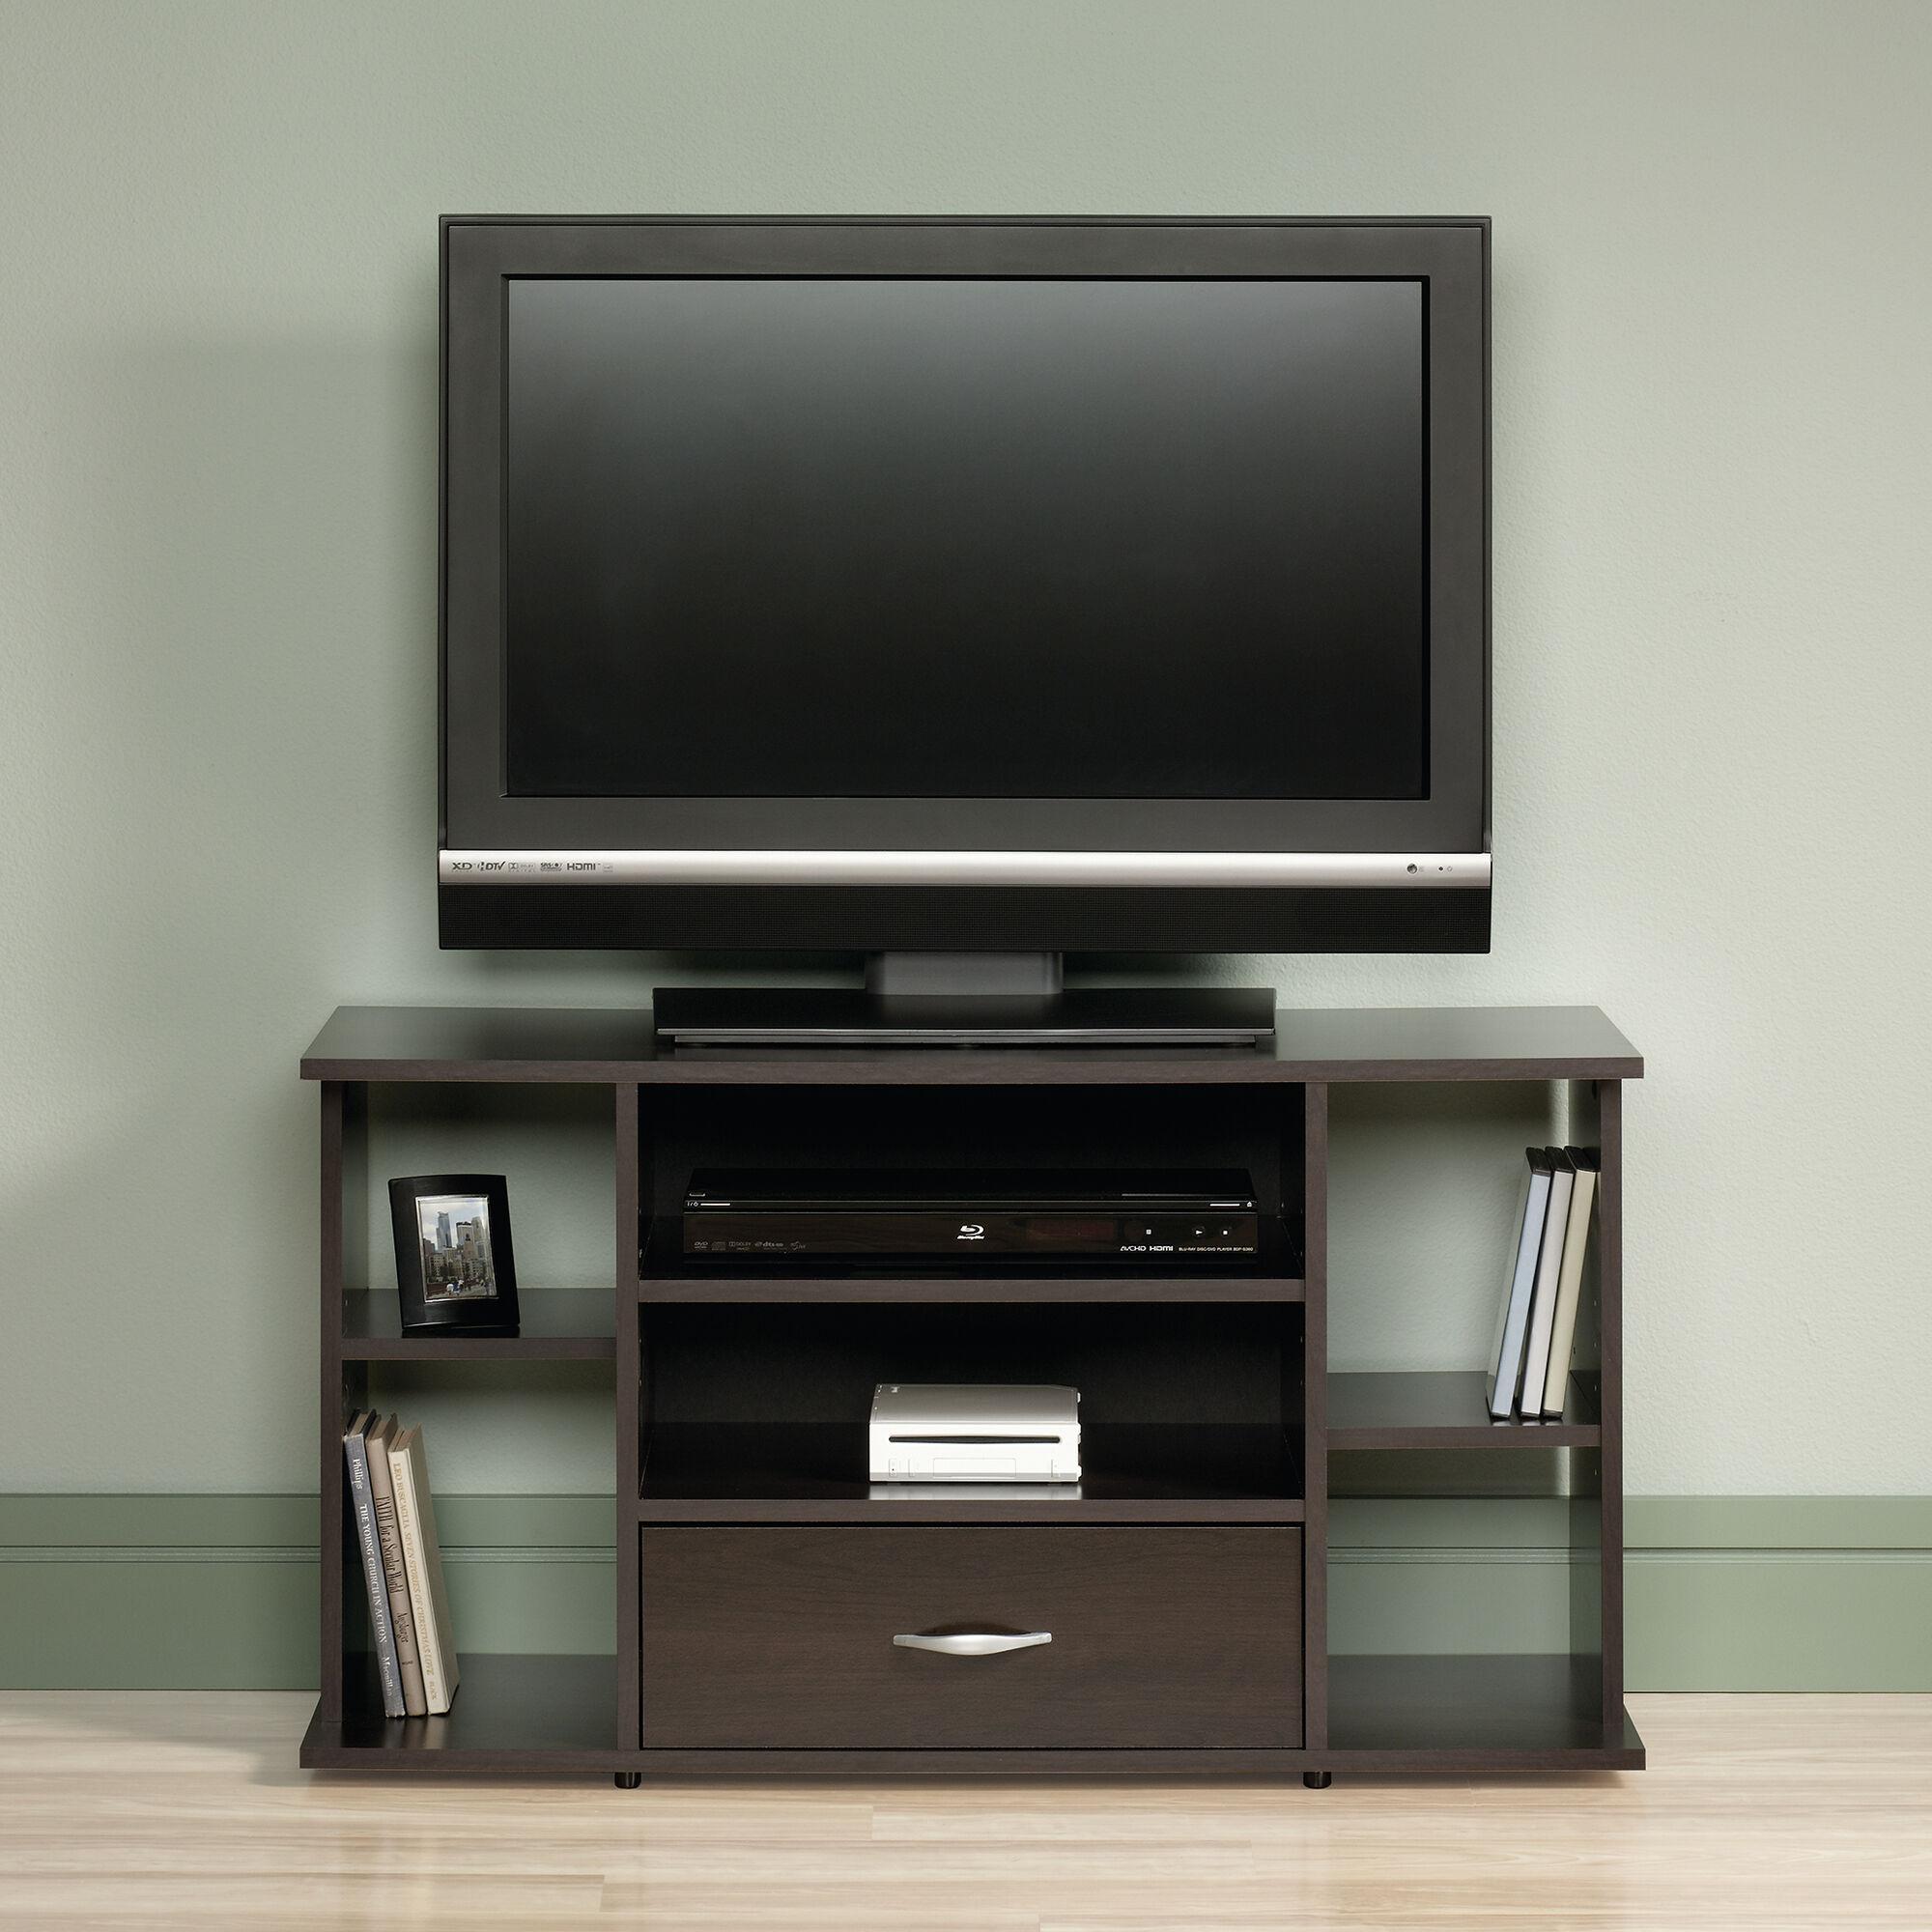 Adjustable Shelf Casual Panel Tv Stand In Cinnamon Cherry Mathis